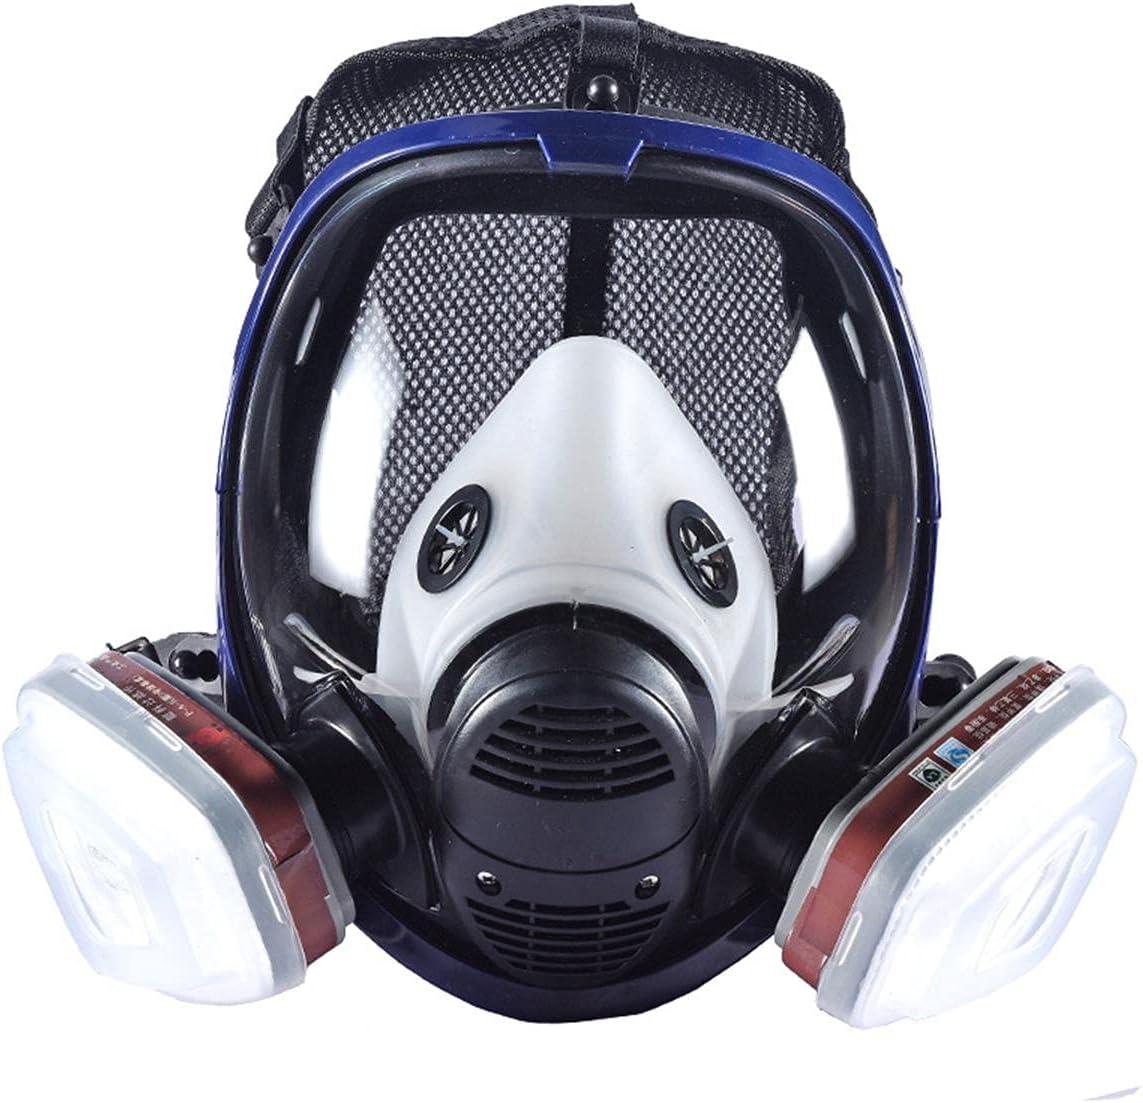 Máscara Química De Gas, 7 En 1 Respirador De Polvo Ácido, Cartucho De Filtro De Gas Orgánico, Utilizado Para Gas Orgánico, Pintura, A Distancia, Polvo De Ácido, Pesticida, Protección